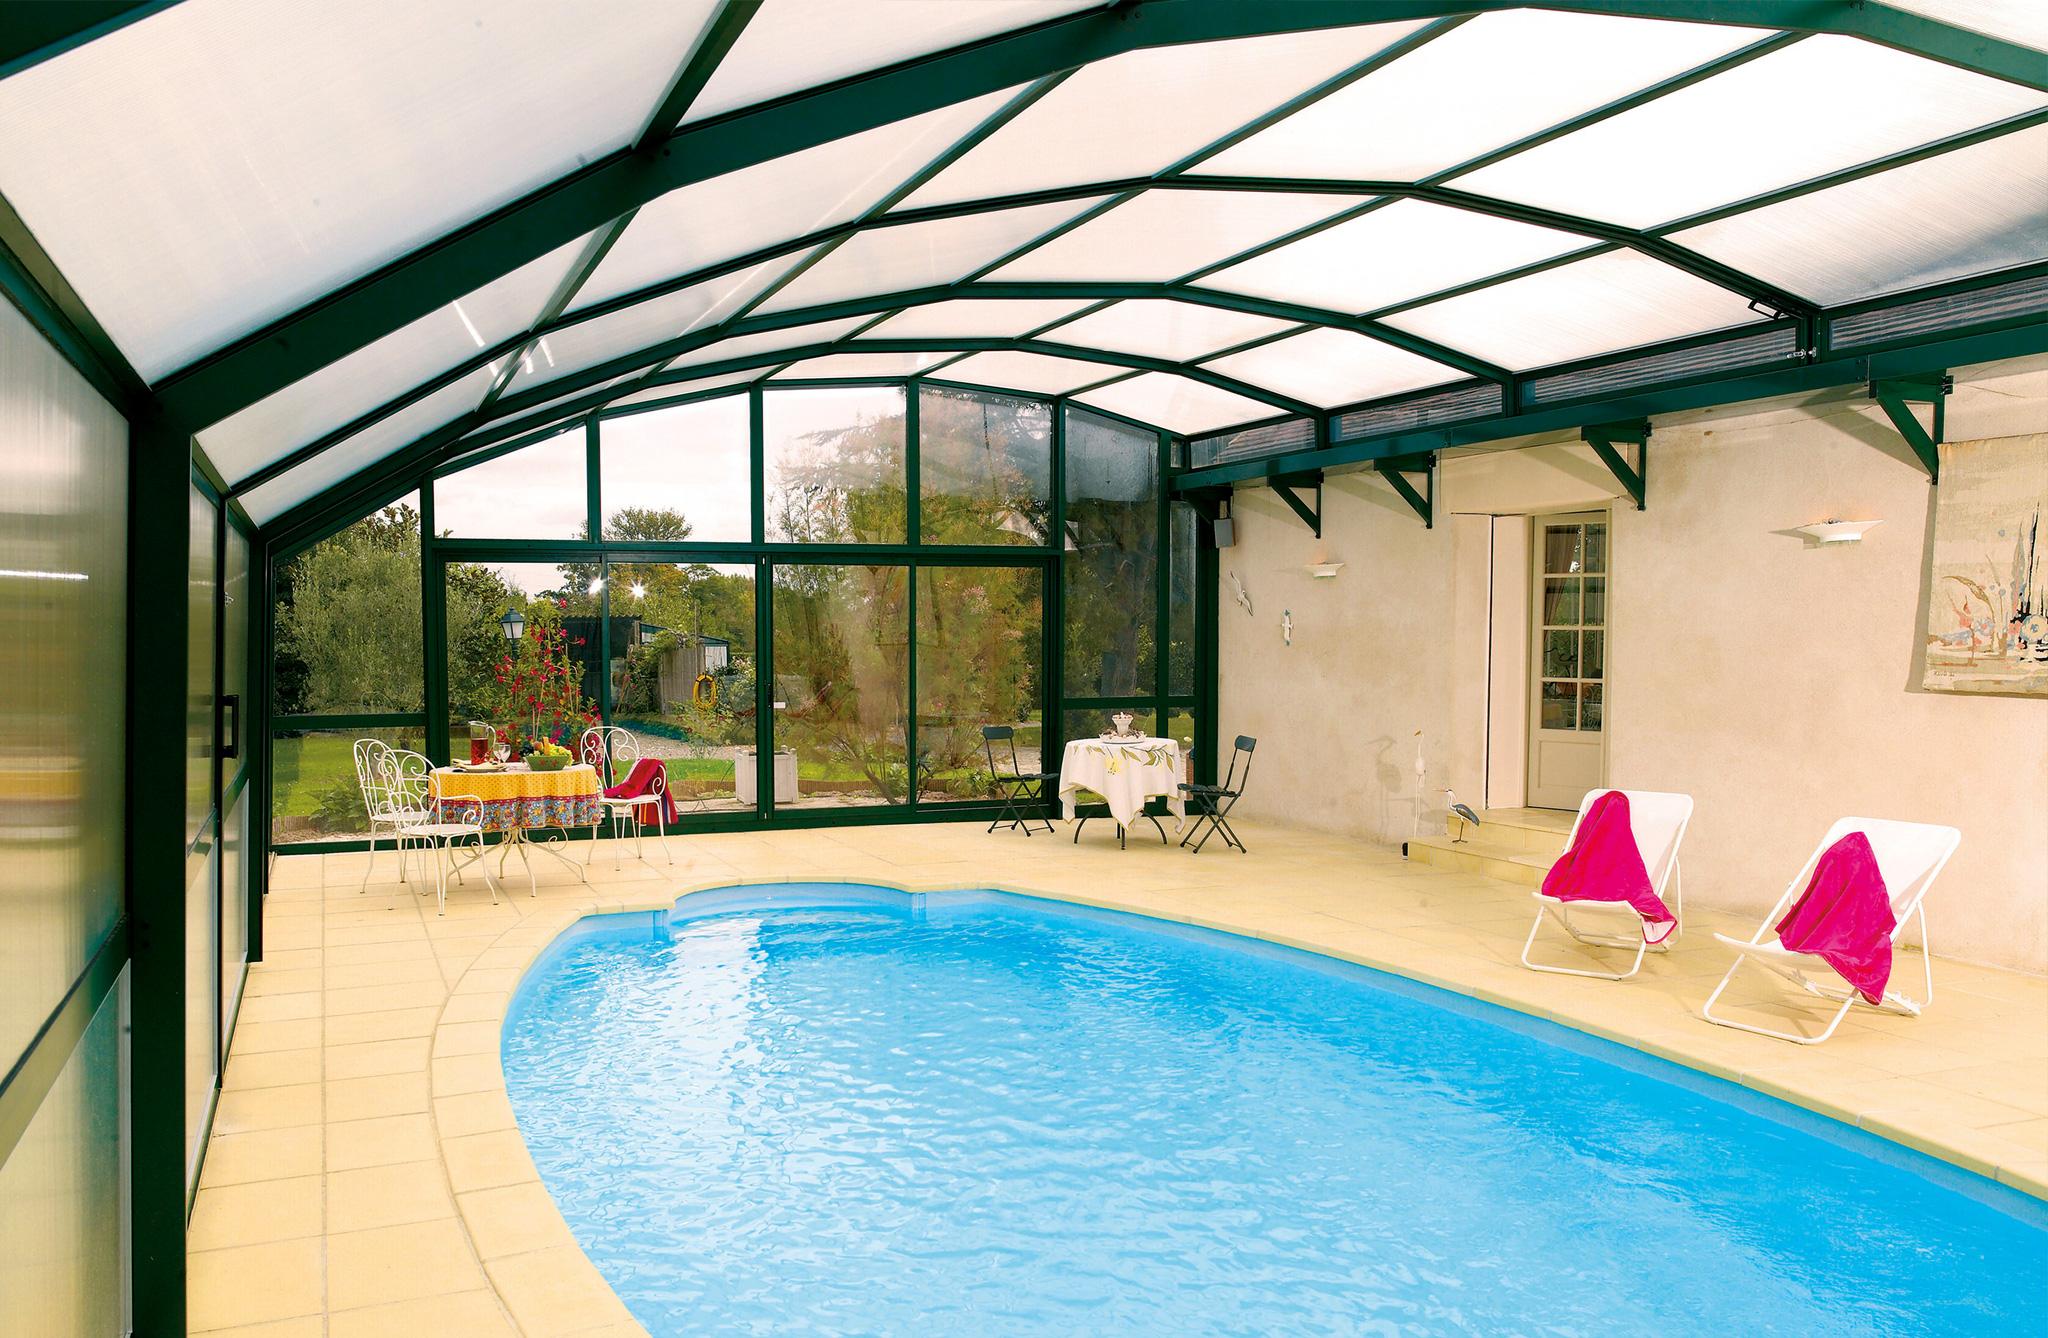 Pool berdachung poolhalle desjoyaux pools for Pool komplettangebot